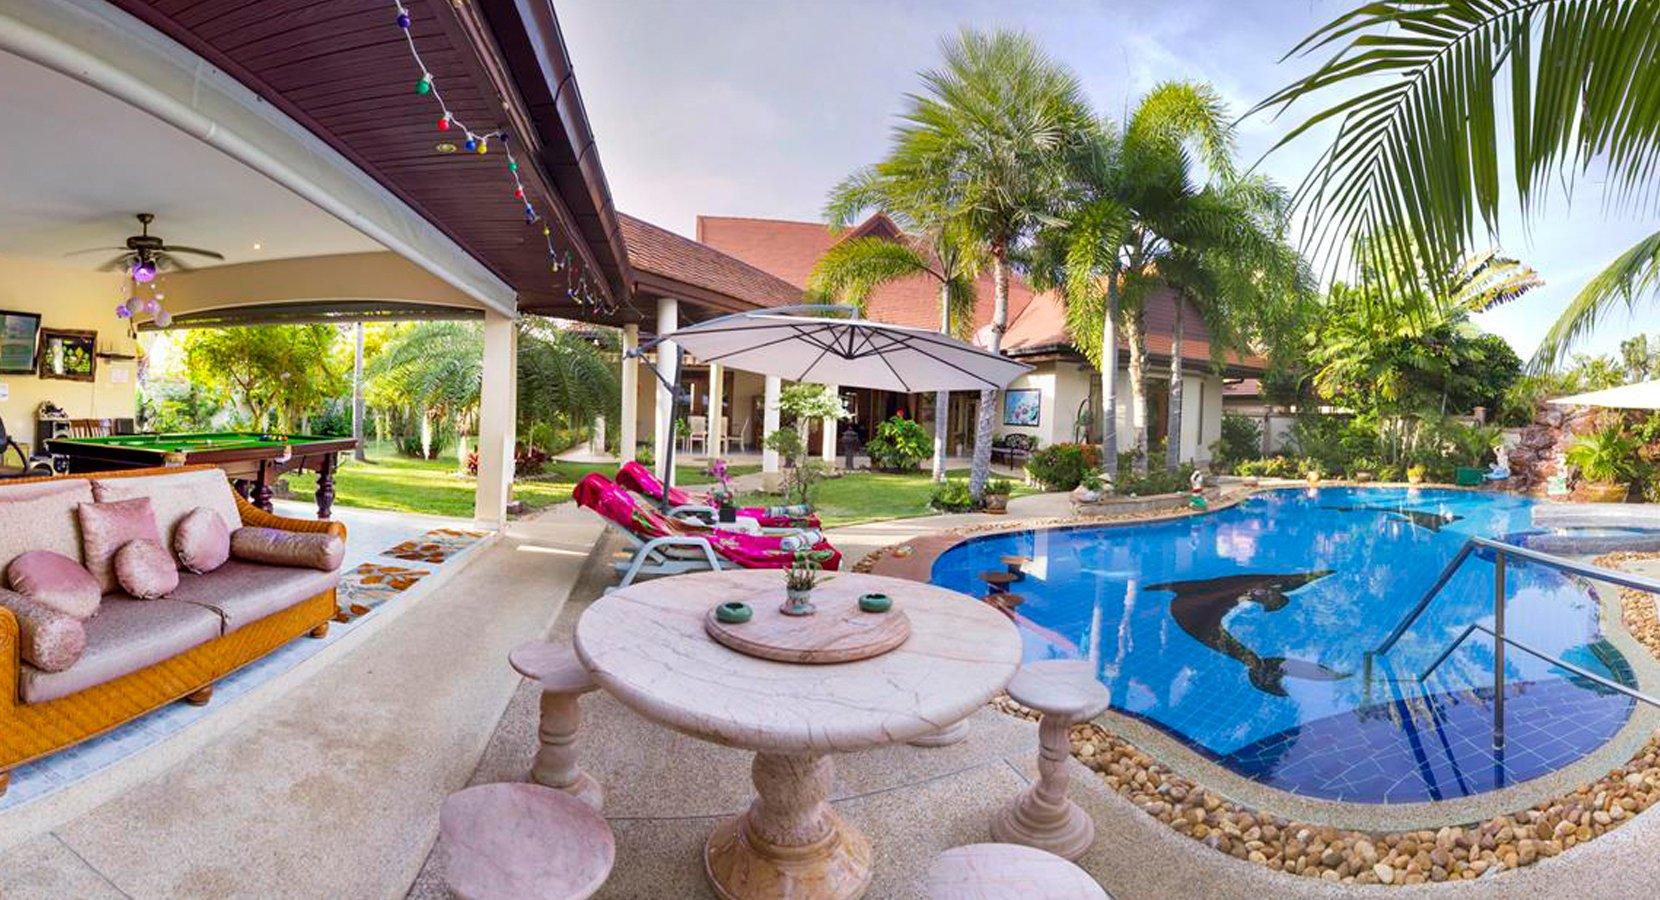 Luxury Villa in Pattaya on Rent View